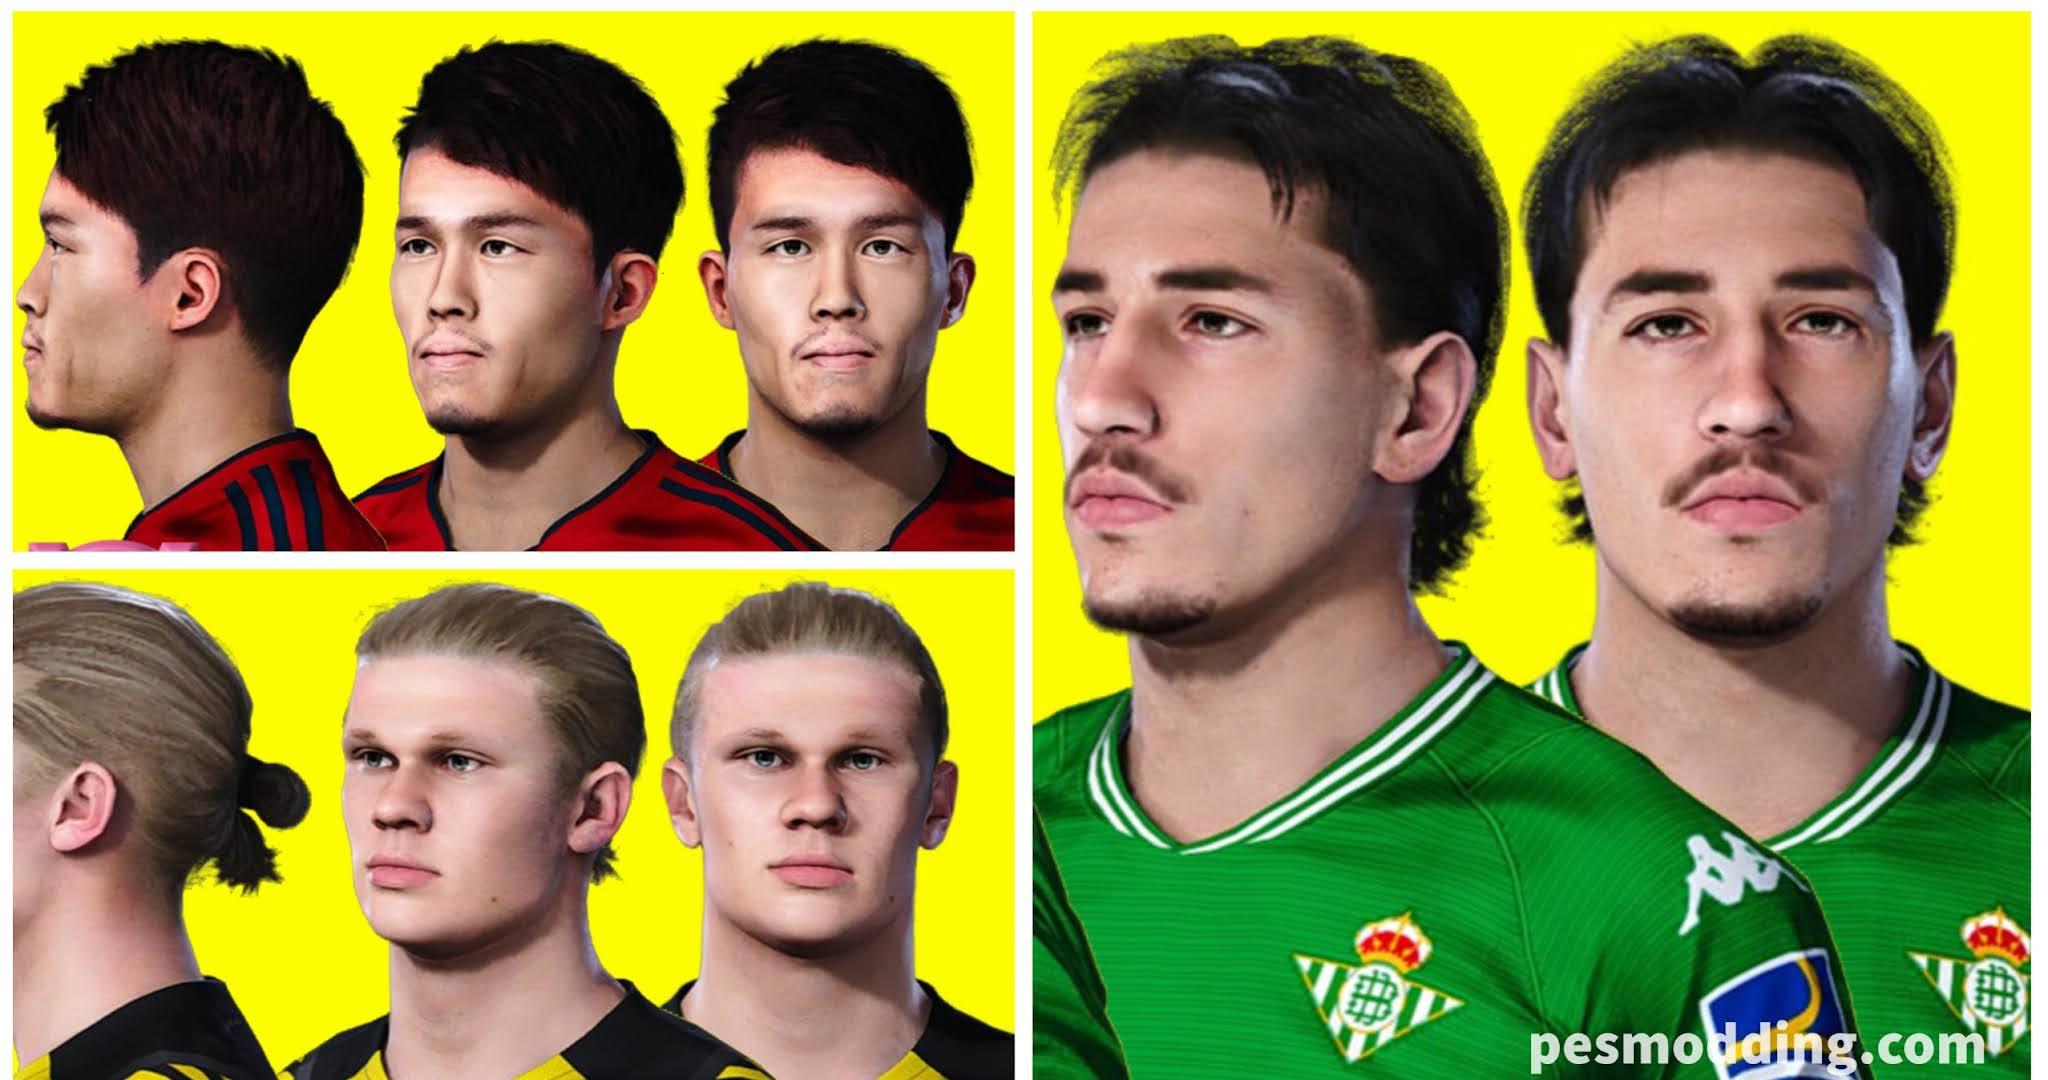 PES 2021 Faces - Takehiro Tomiyasu, Hector Bellerin and Erling Haaland